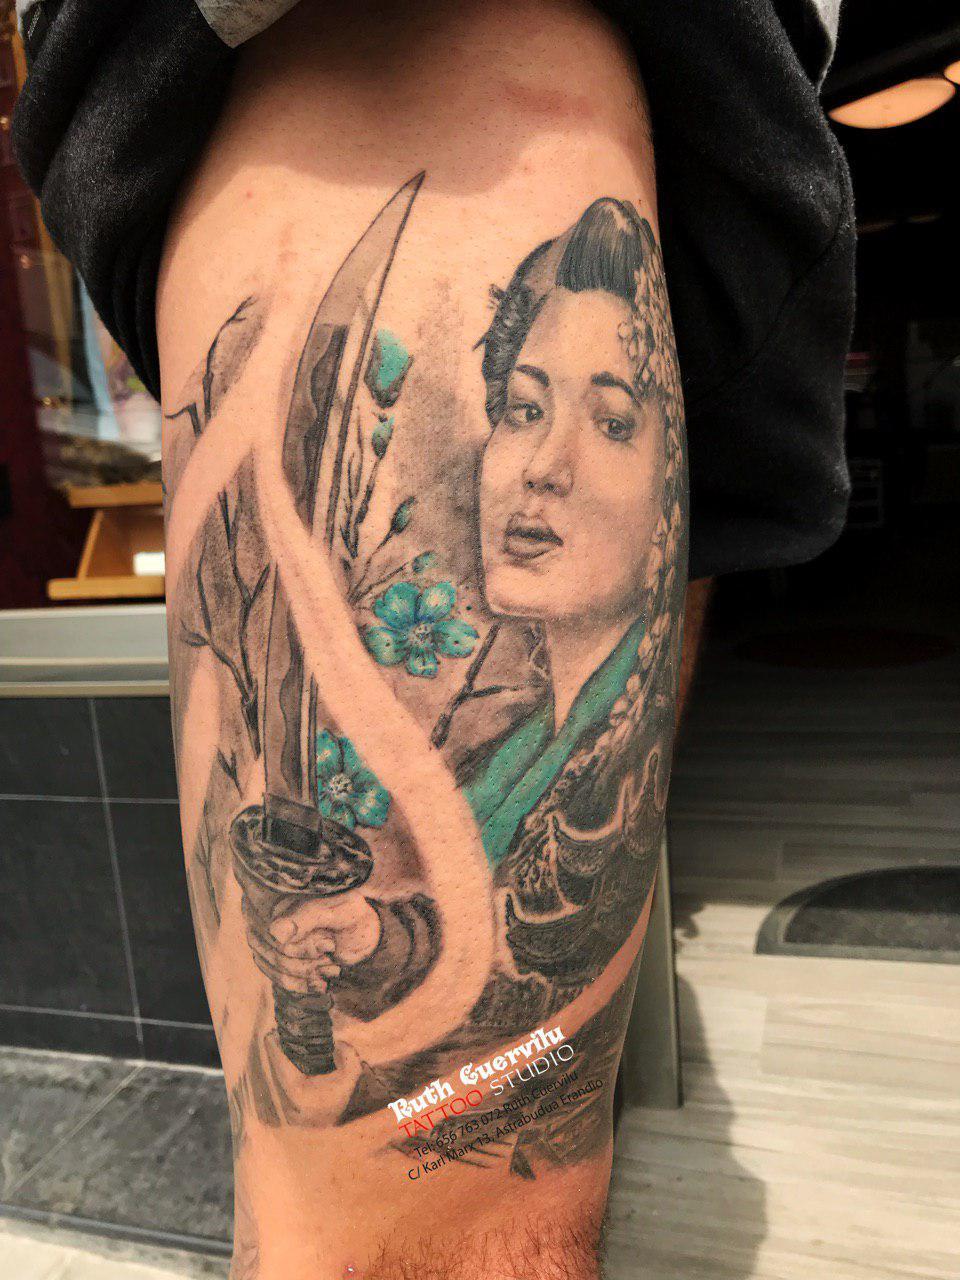 tattoo geisha espada - ruth cuervilu tattoo - KM13 Studio, Astrabudua, erandio Bizkaia